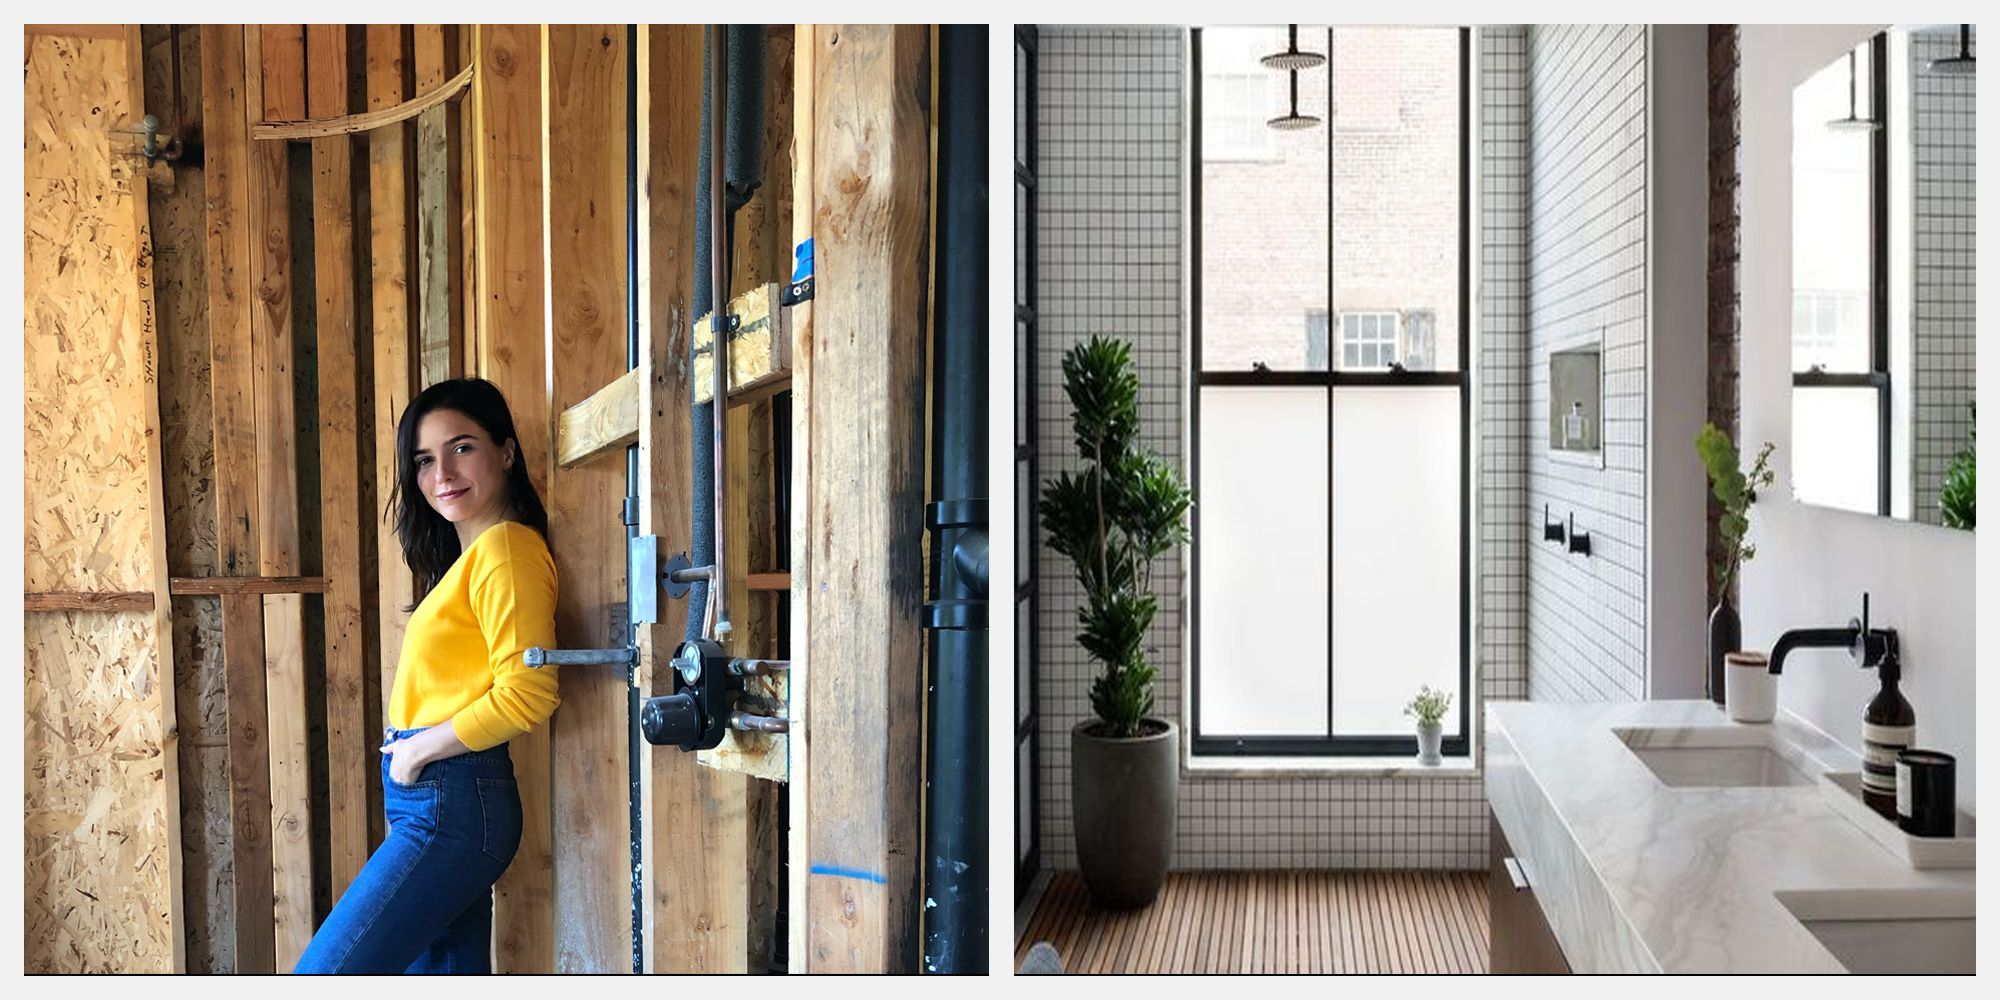 Inside Actress Sophia Bush's Plans for Her Dramatic Bathroom Renovation